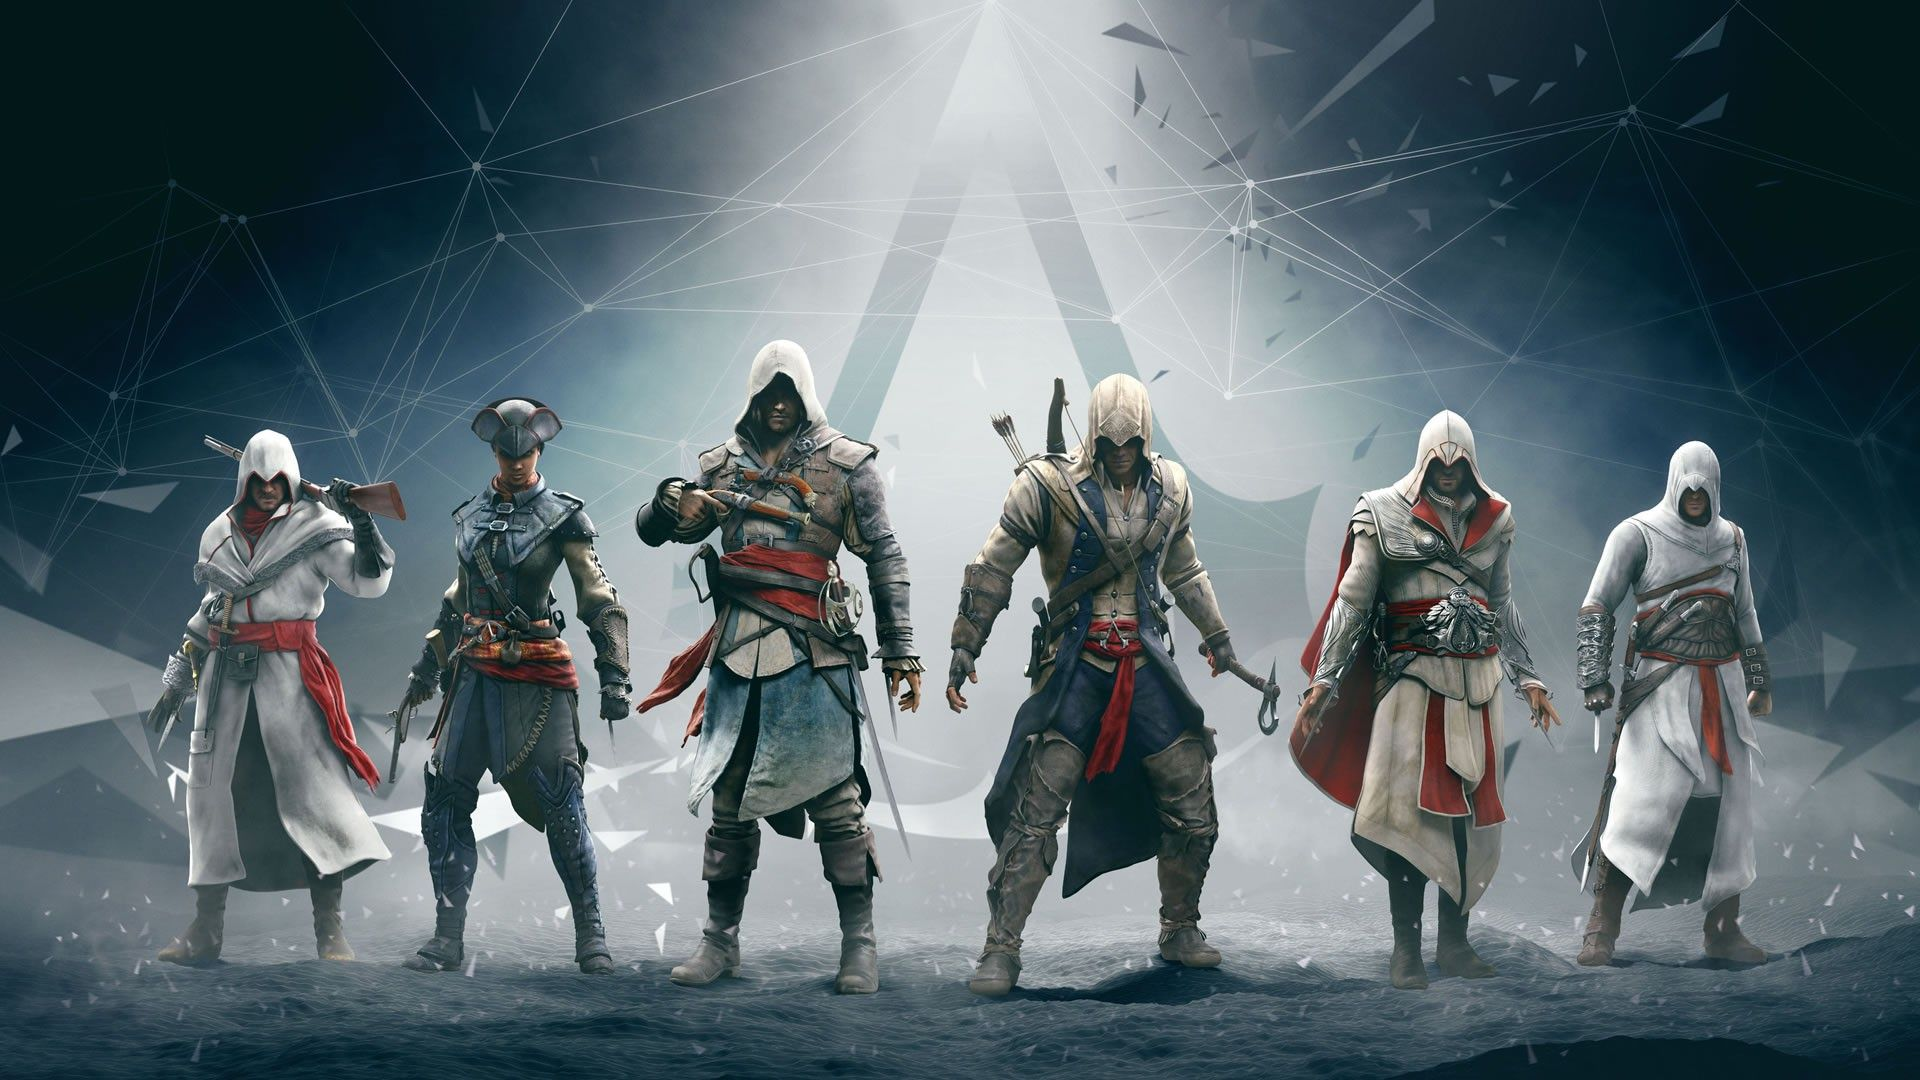 Assassins Creed Unity Wallpaper 3